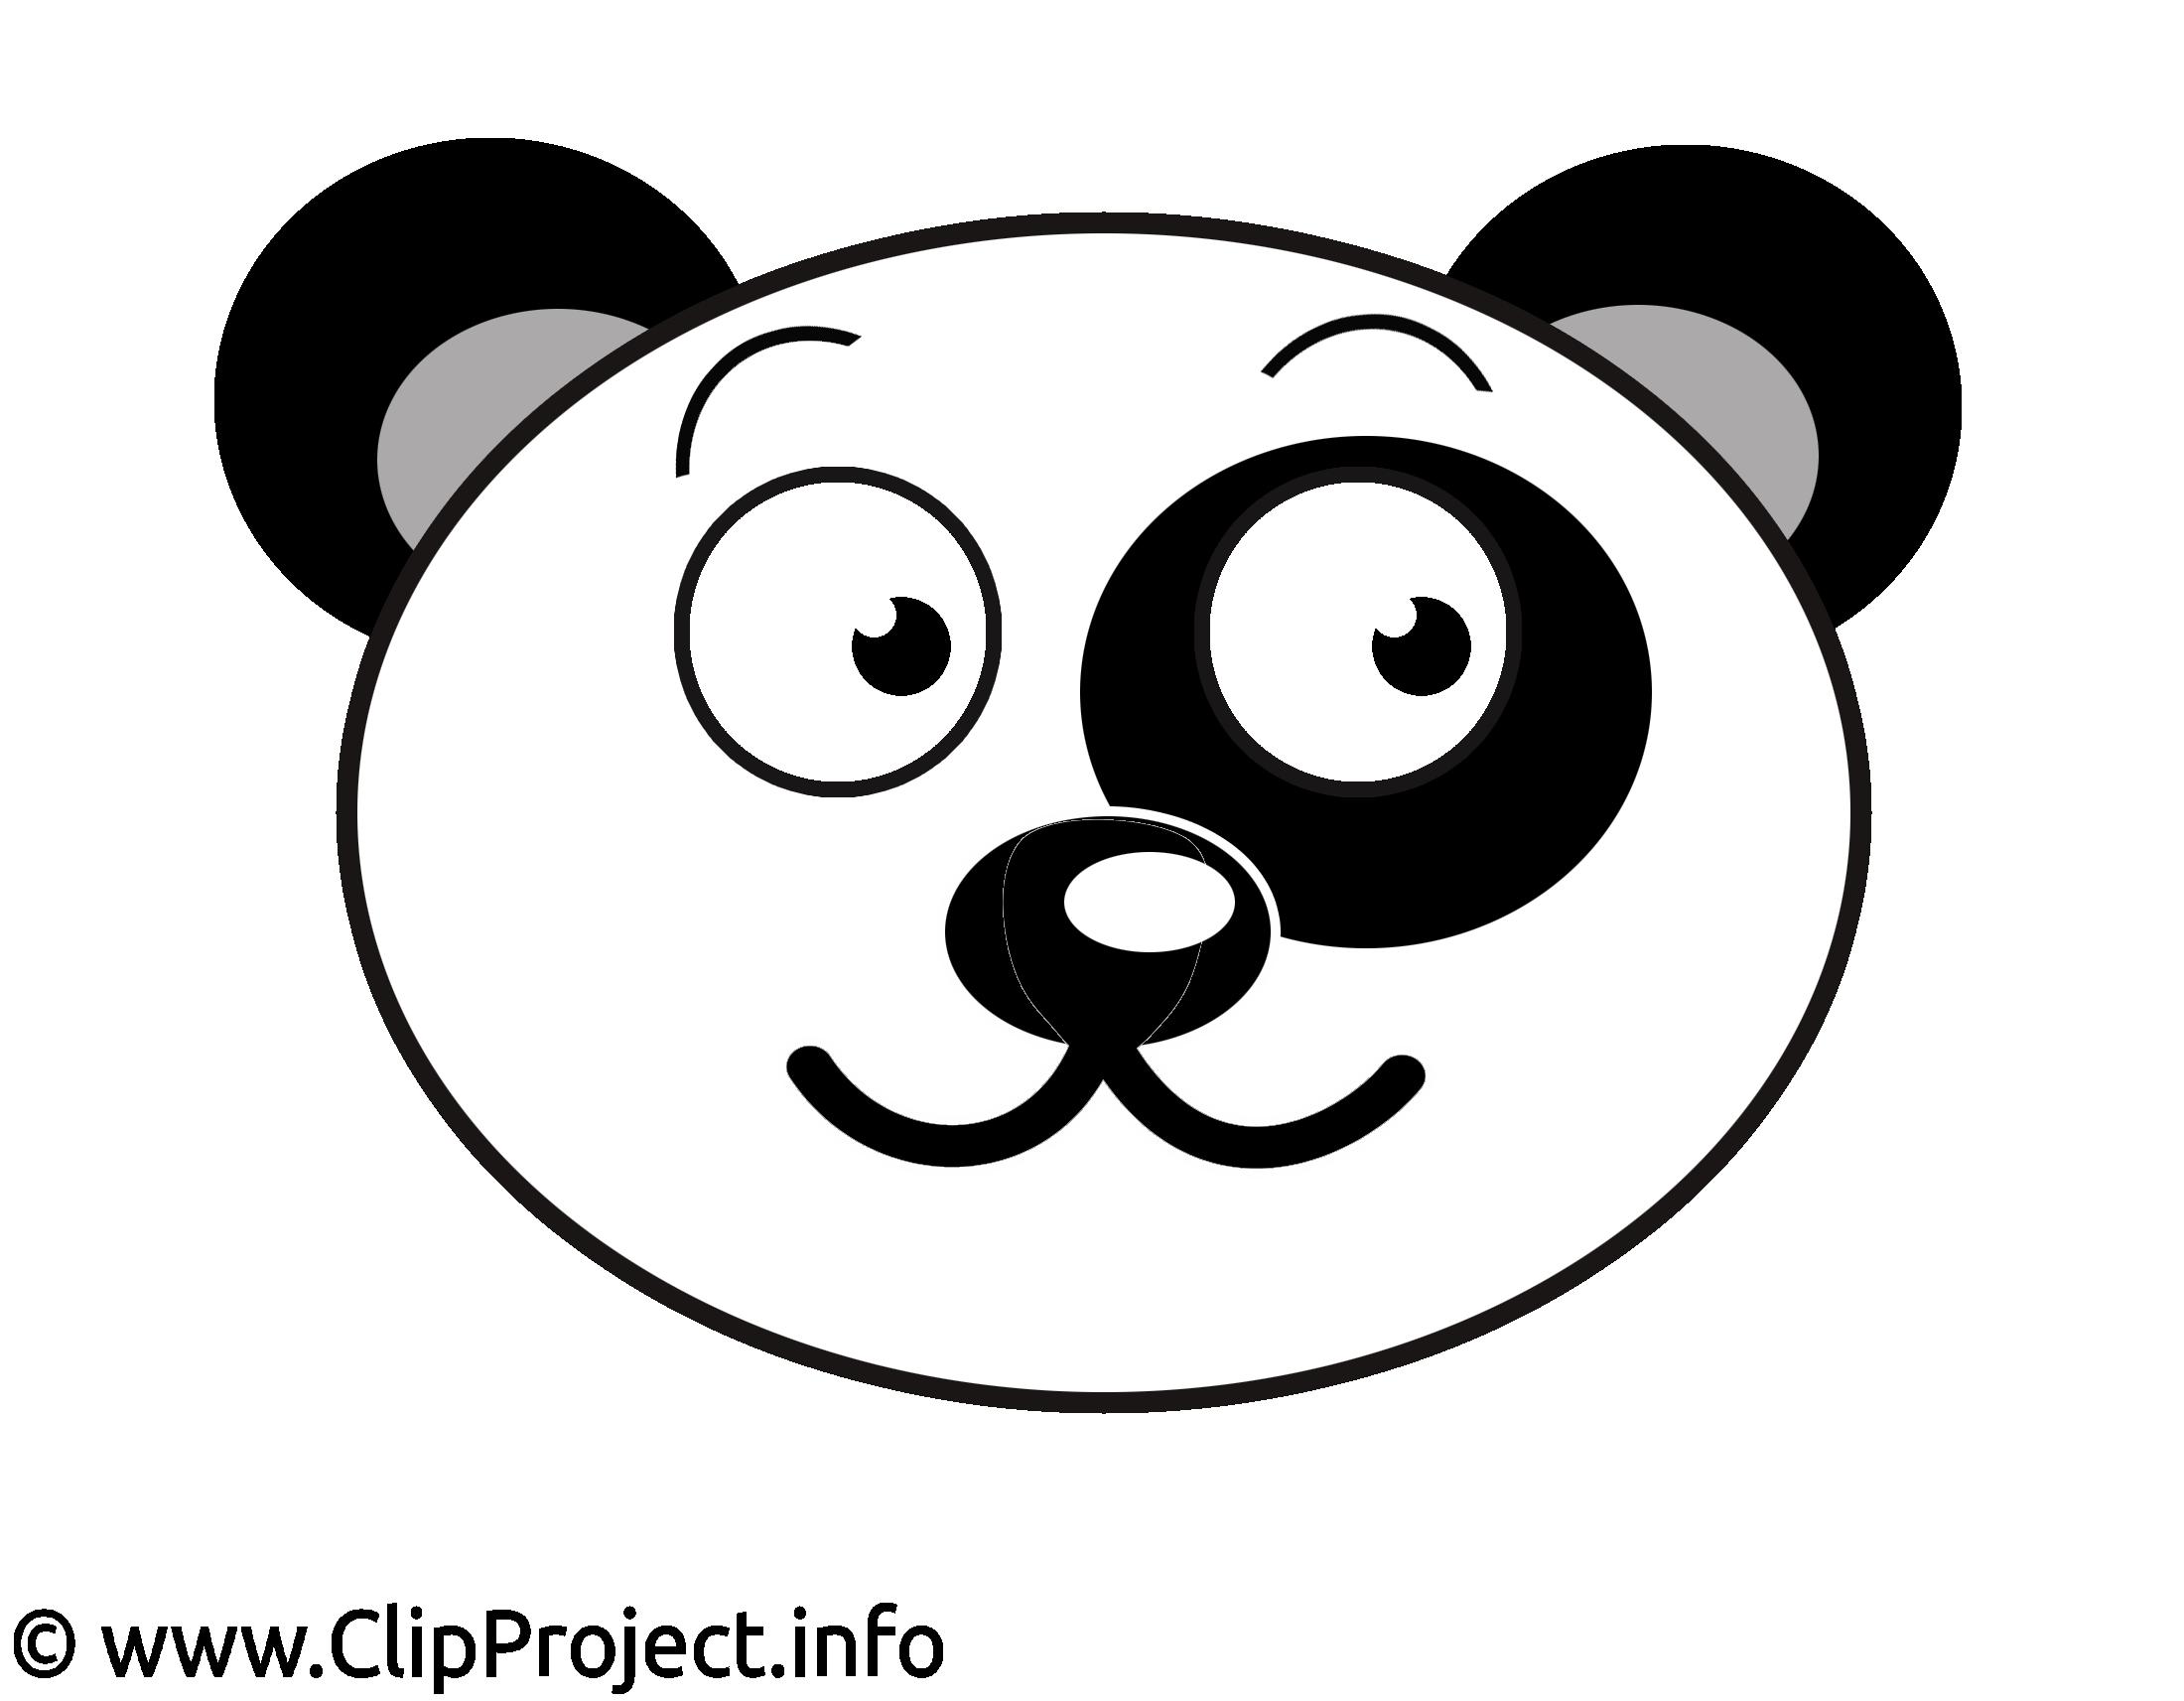 Panda illustration gratuite – Dessin clipart